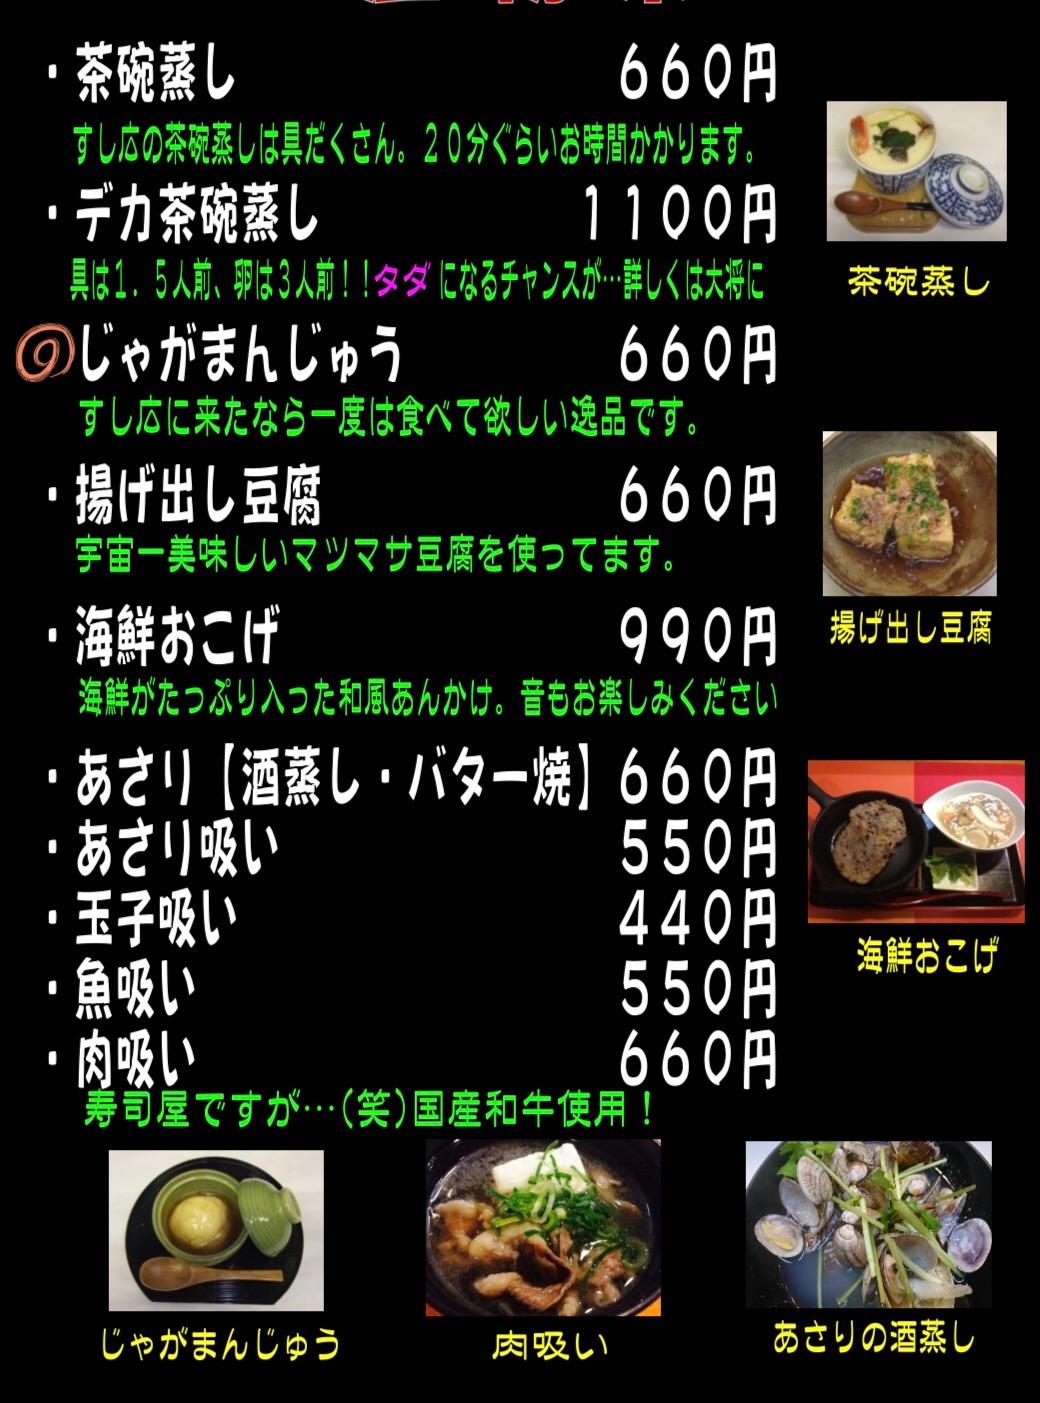 f:id:carp_0301_kenta:20191023173005j:image